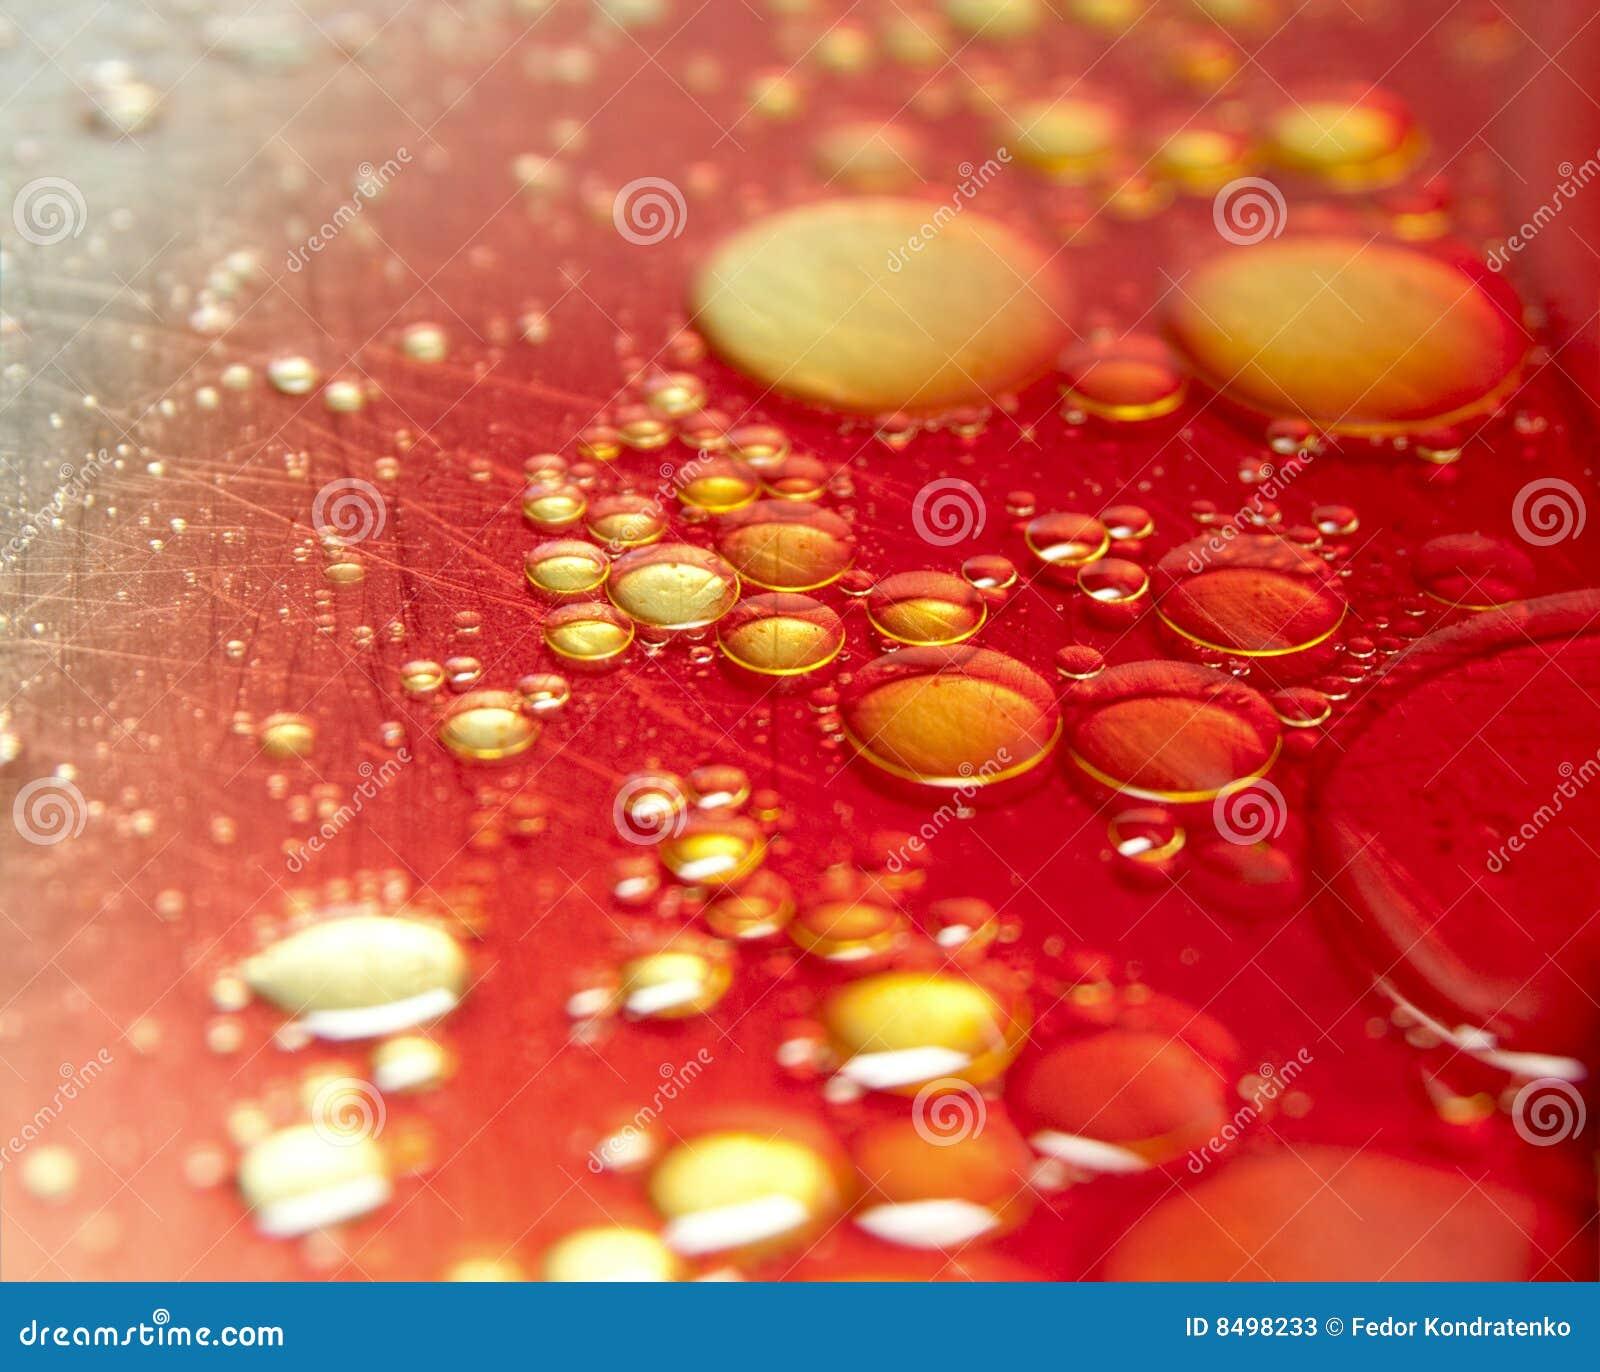 Bubbles of oil in blood on scraped metal